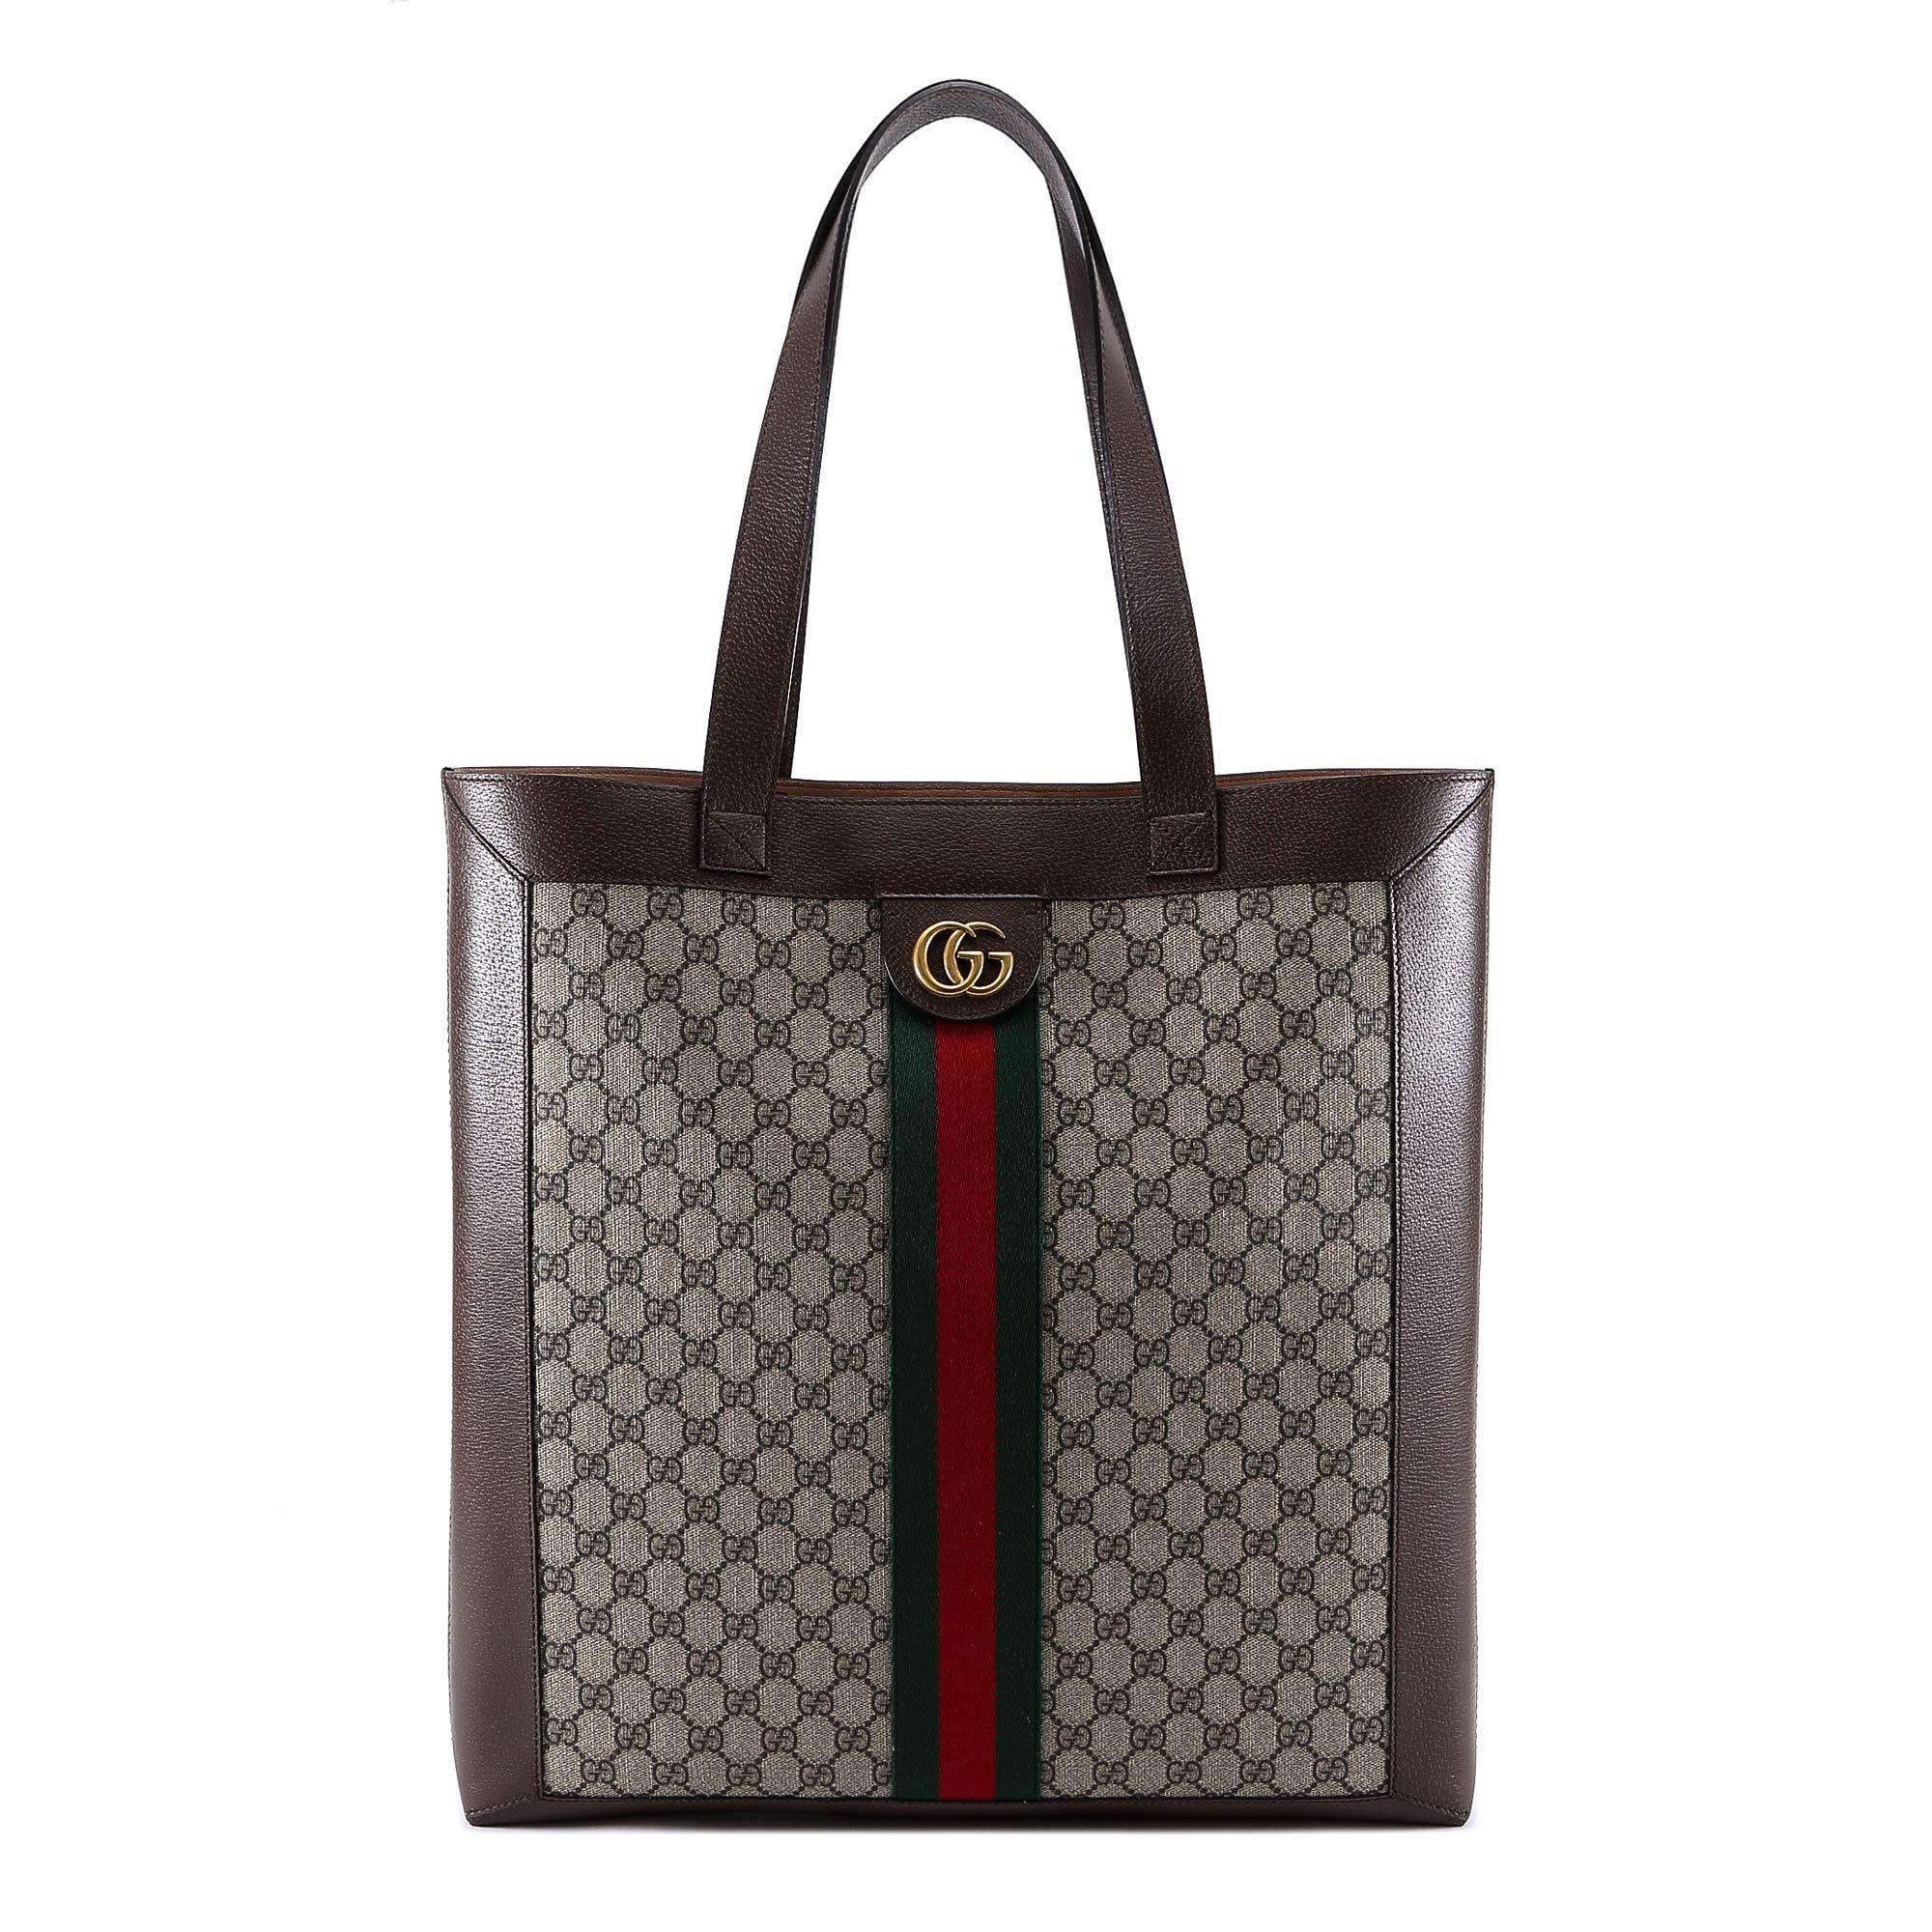 3593a5d20d5 Lyst - Gucci GG Supreme Tote Bag in Natural